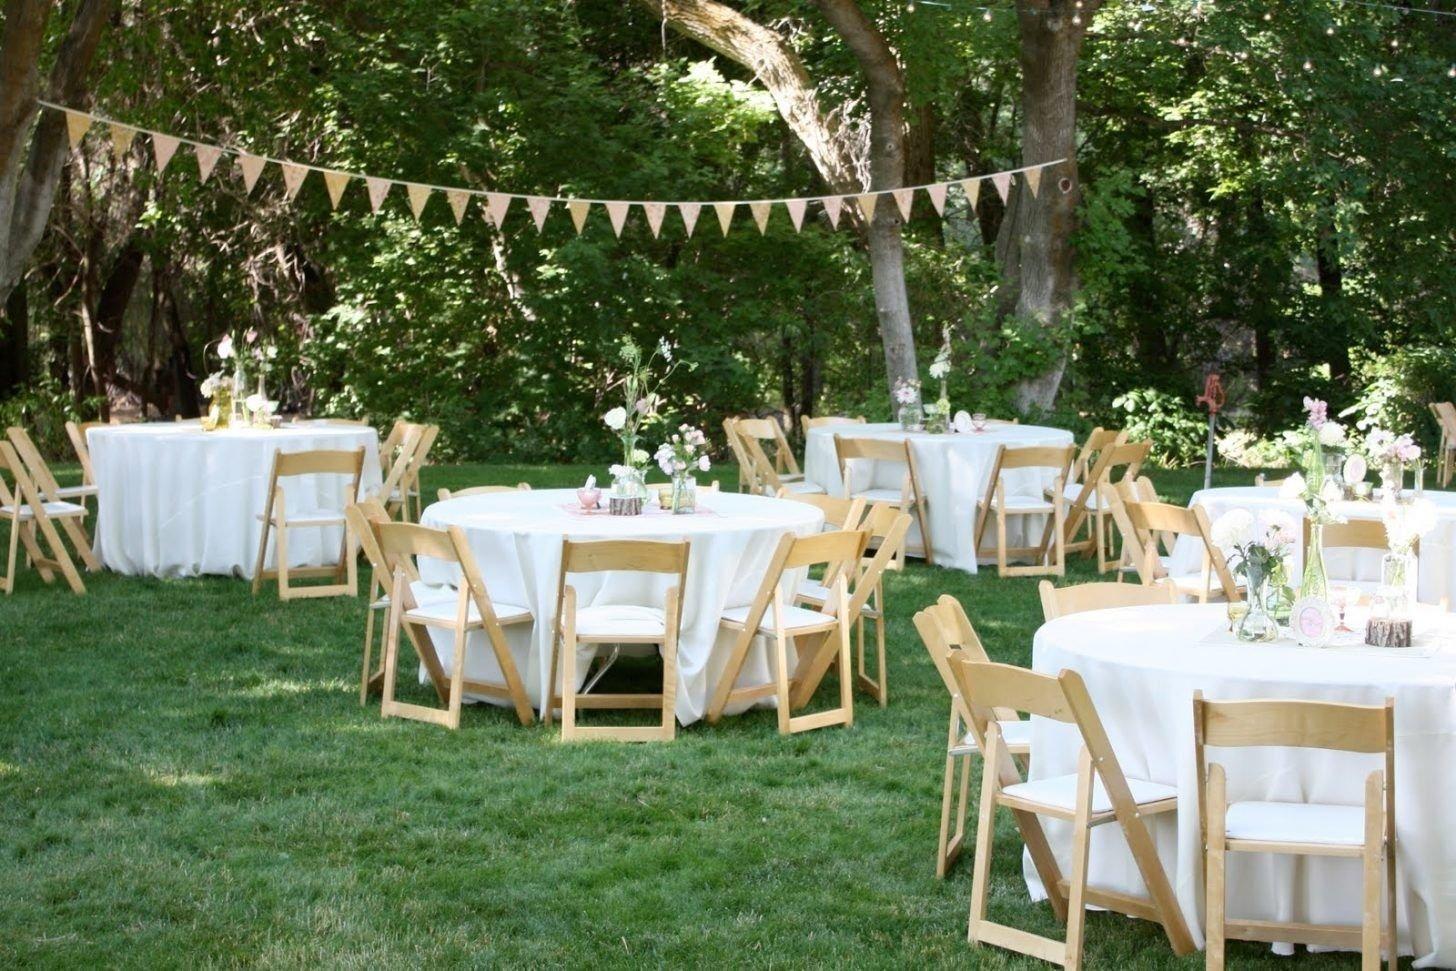 10 Cute Backyard Wedding Ideas For Summer incredible best decorating ideas for a backyard wedding pics of how